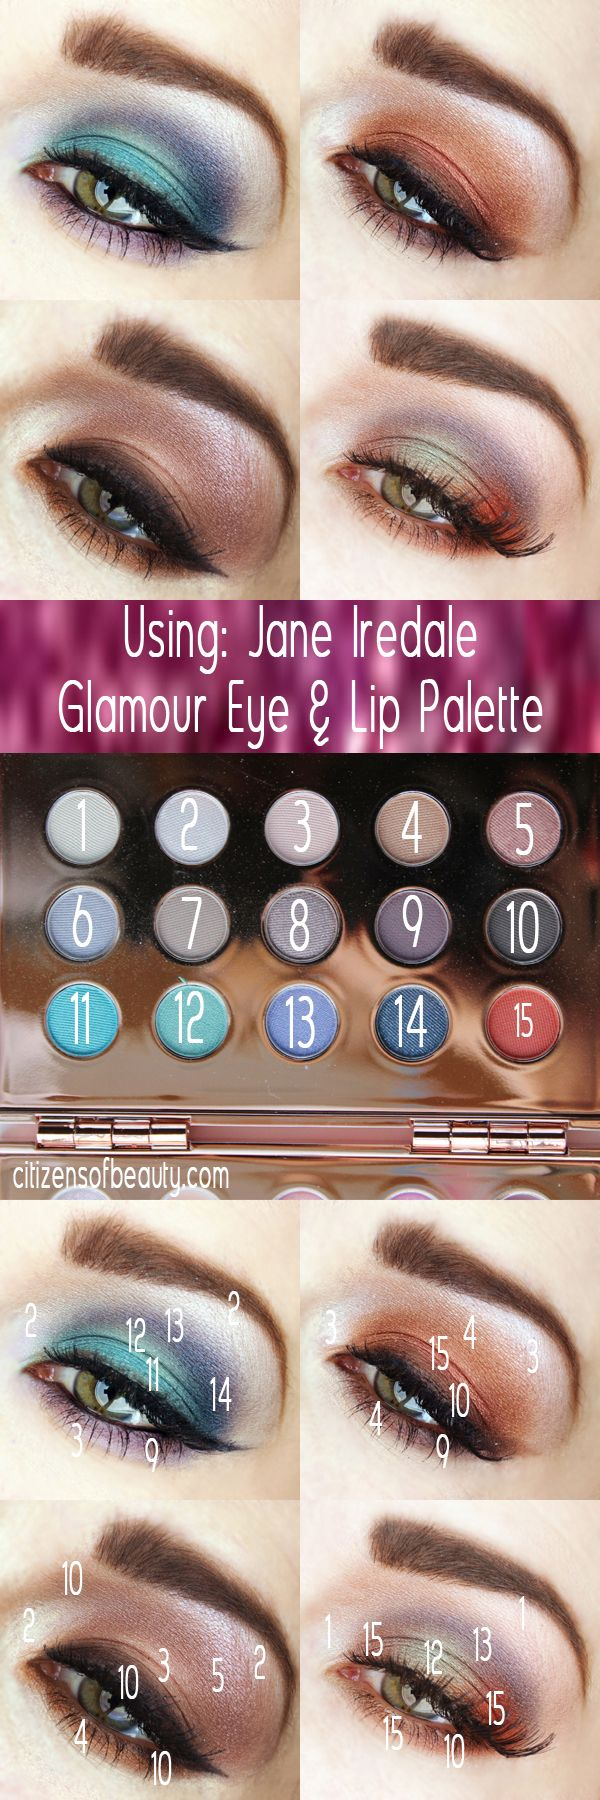 Review Jane Iredale Glamour Eye & Lip Palette Lip